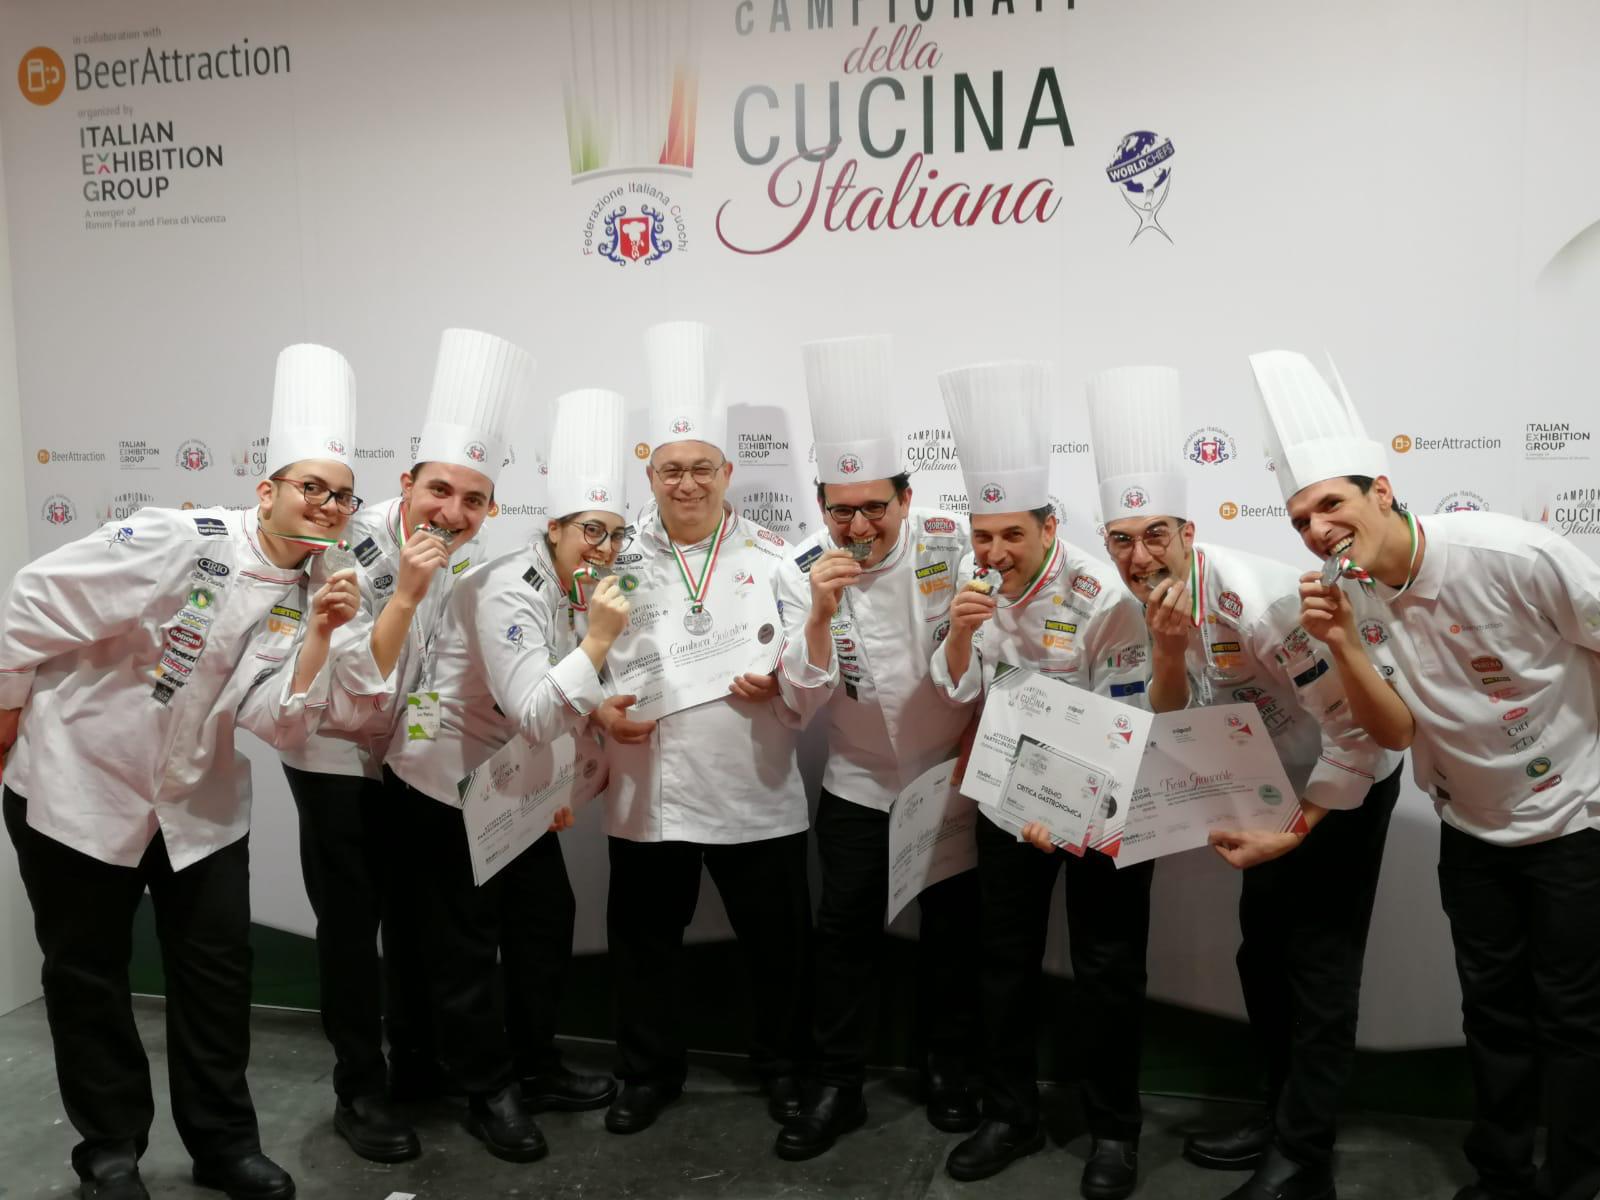 Culinary team Palermo, medaglia d'argento ai Campionati di cucina italiana